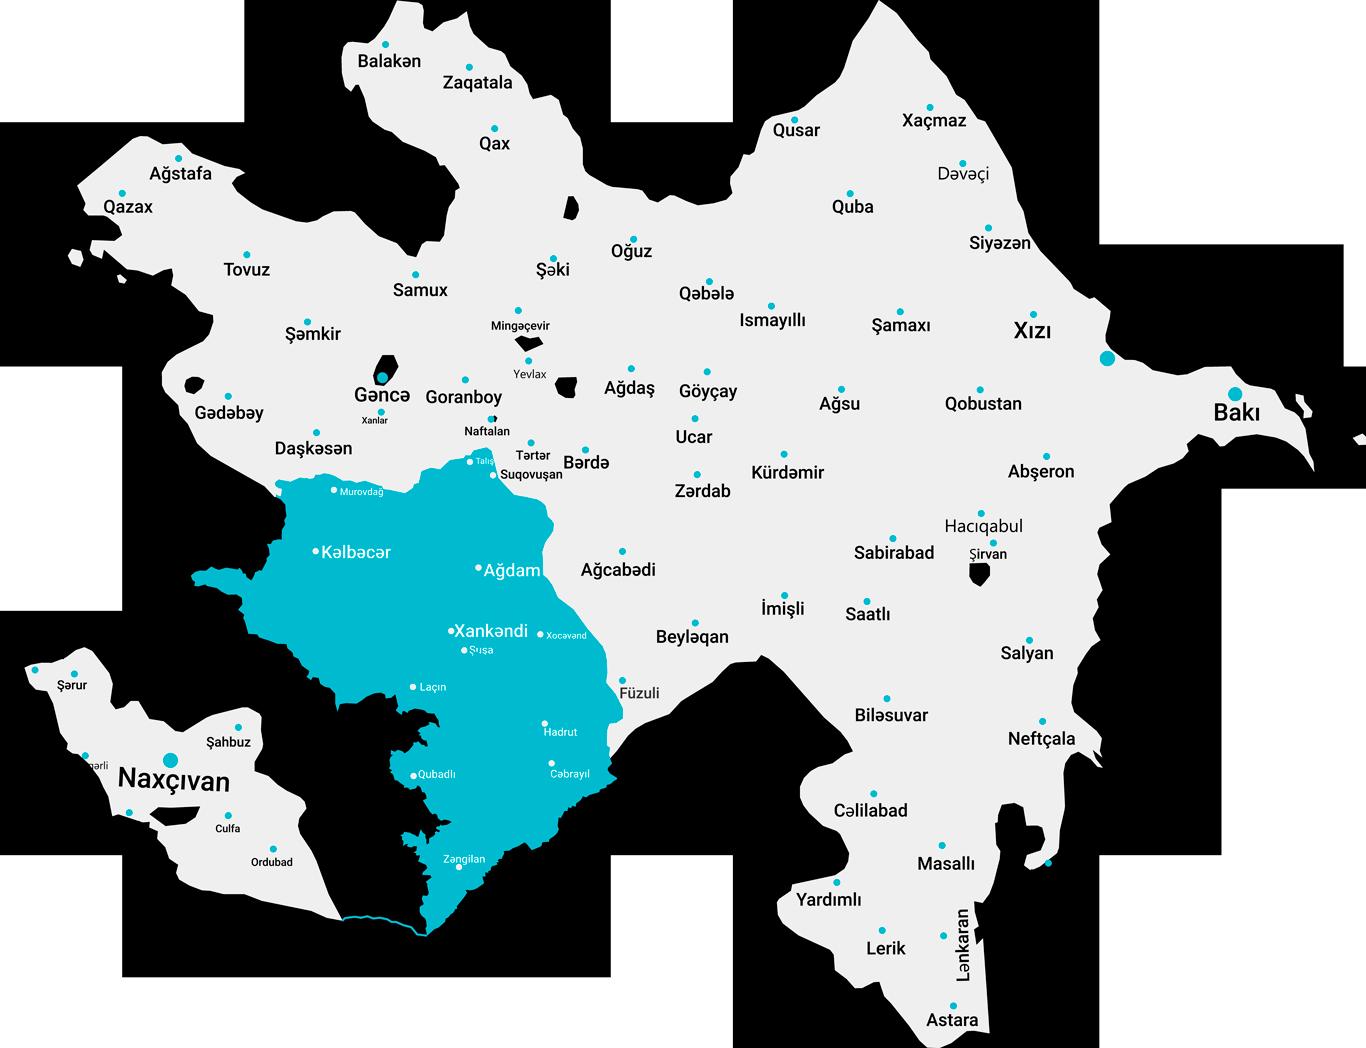 Karabaxh is Azerbaijan!